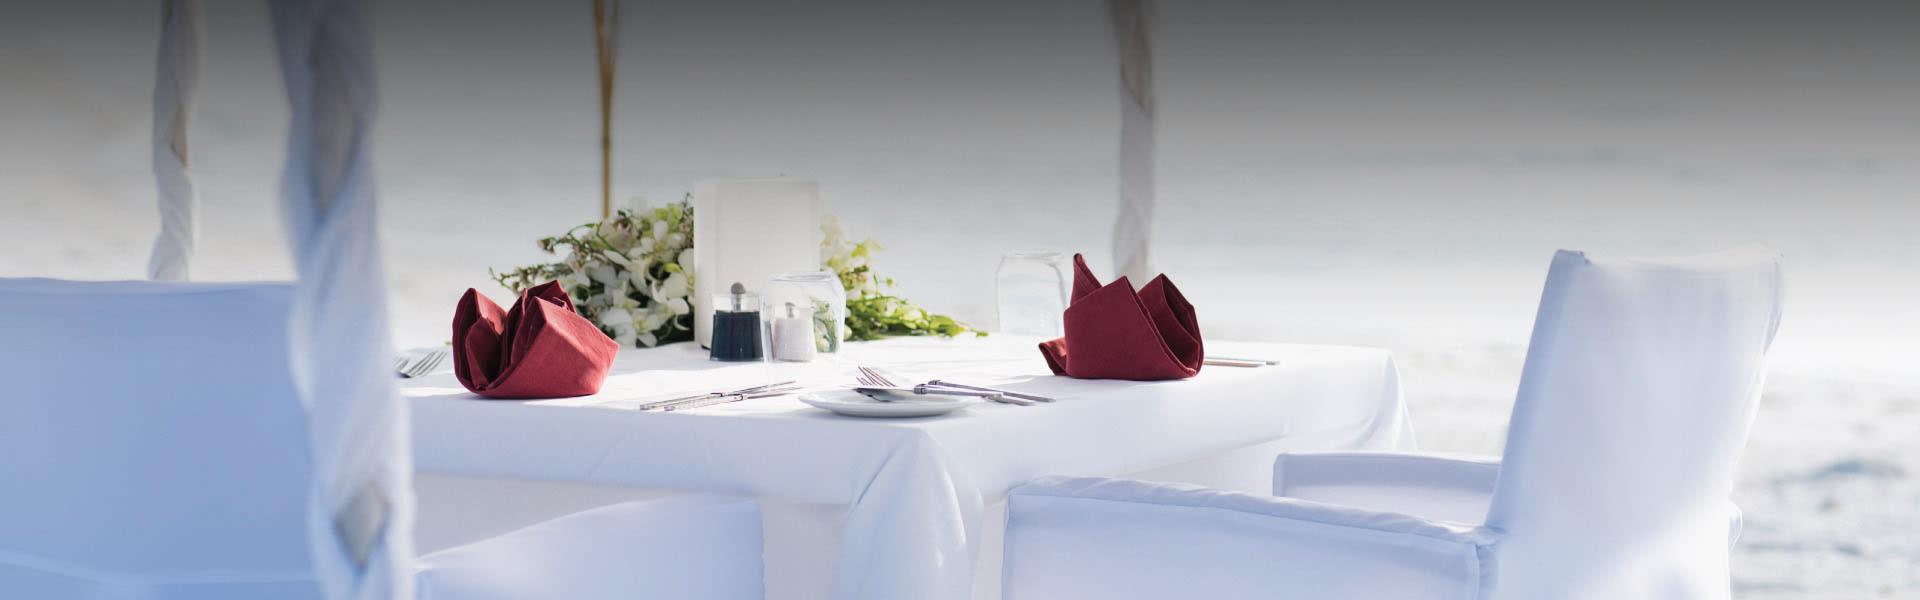 Anantara Veli Adult Resort Dining by Design